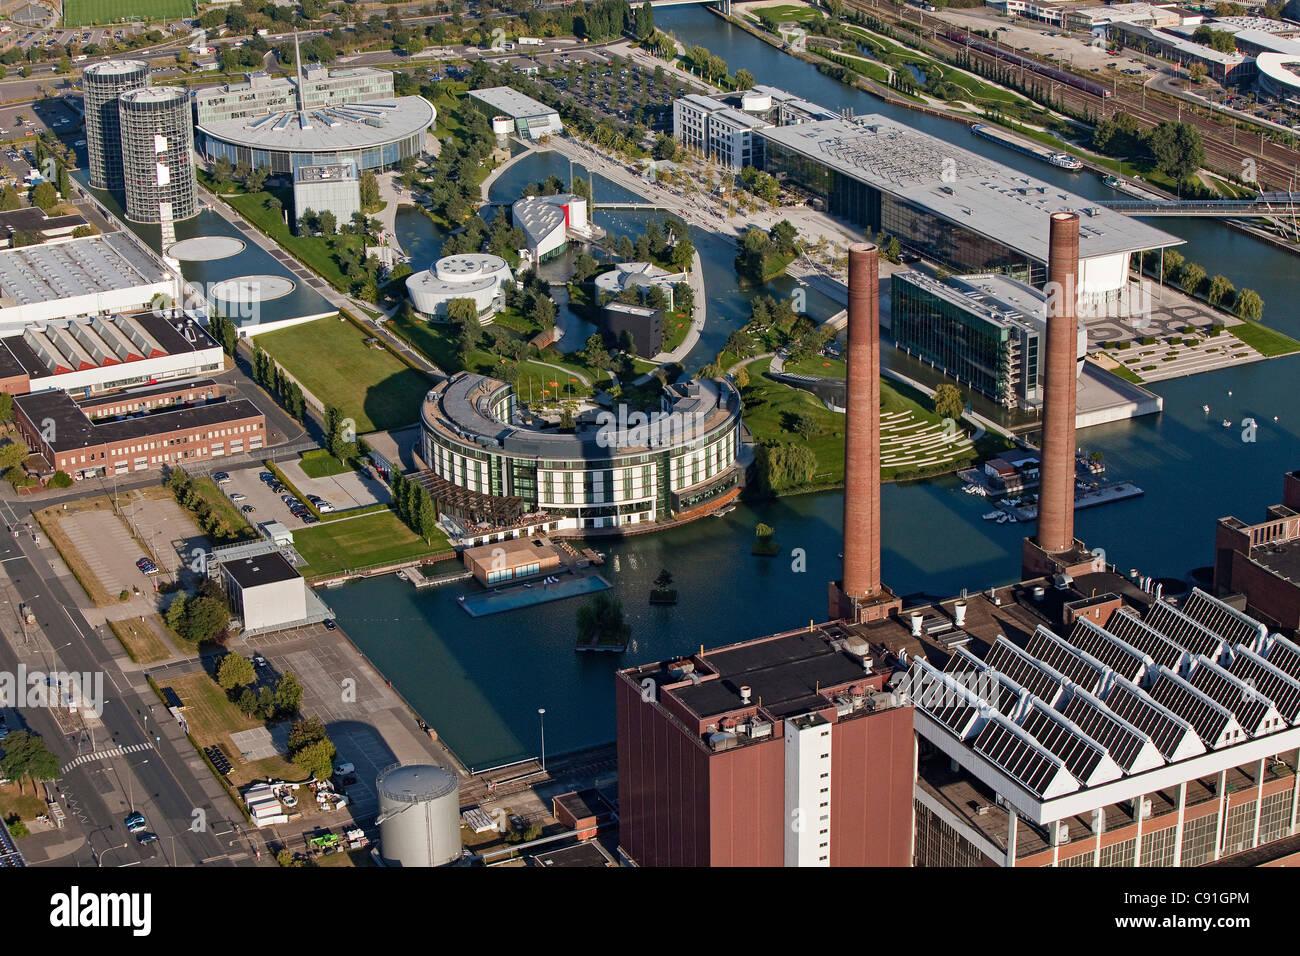 Vista aérea de Volkswagen Autostadt, naves y parque, Wolfsburgo, Baja Sajonia, Alemania Imagen De Stock